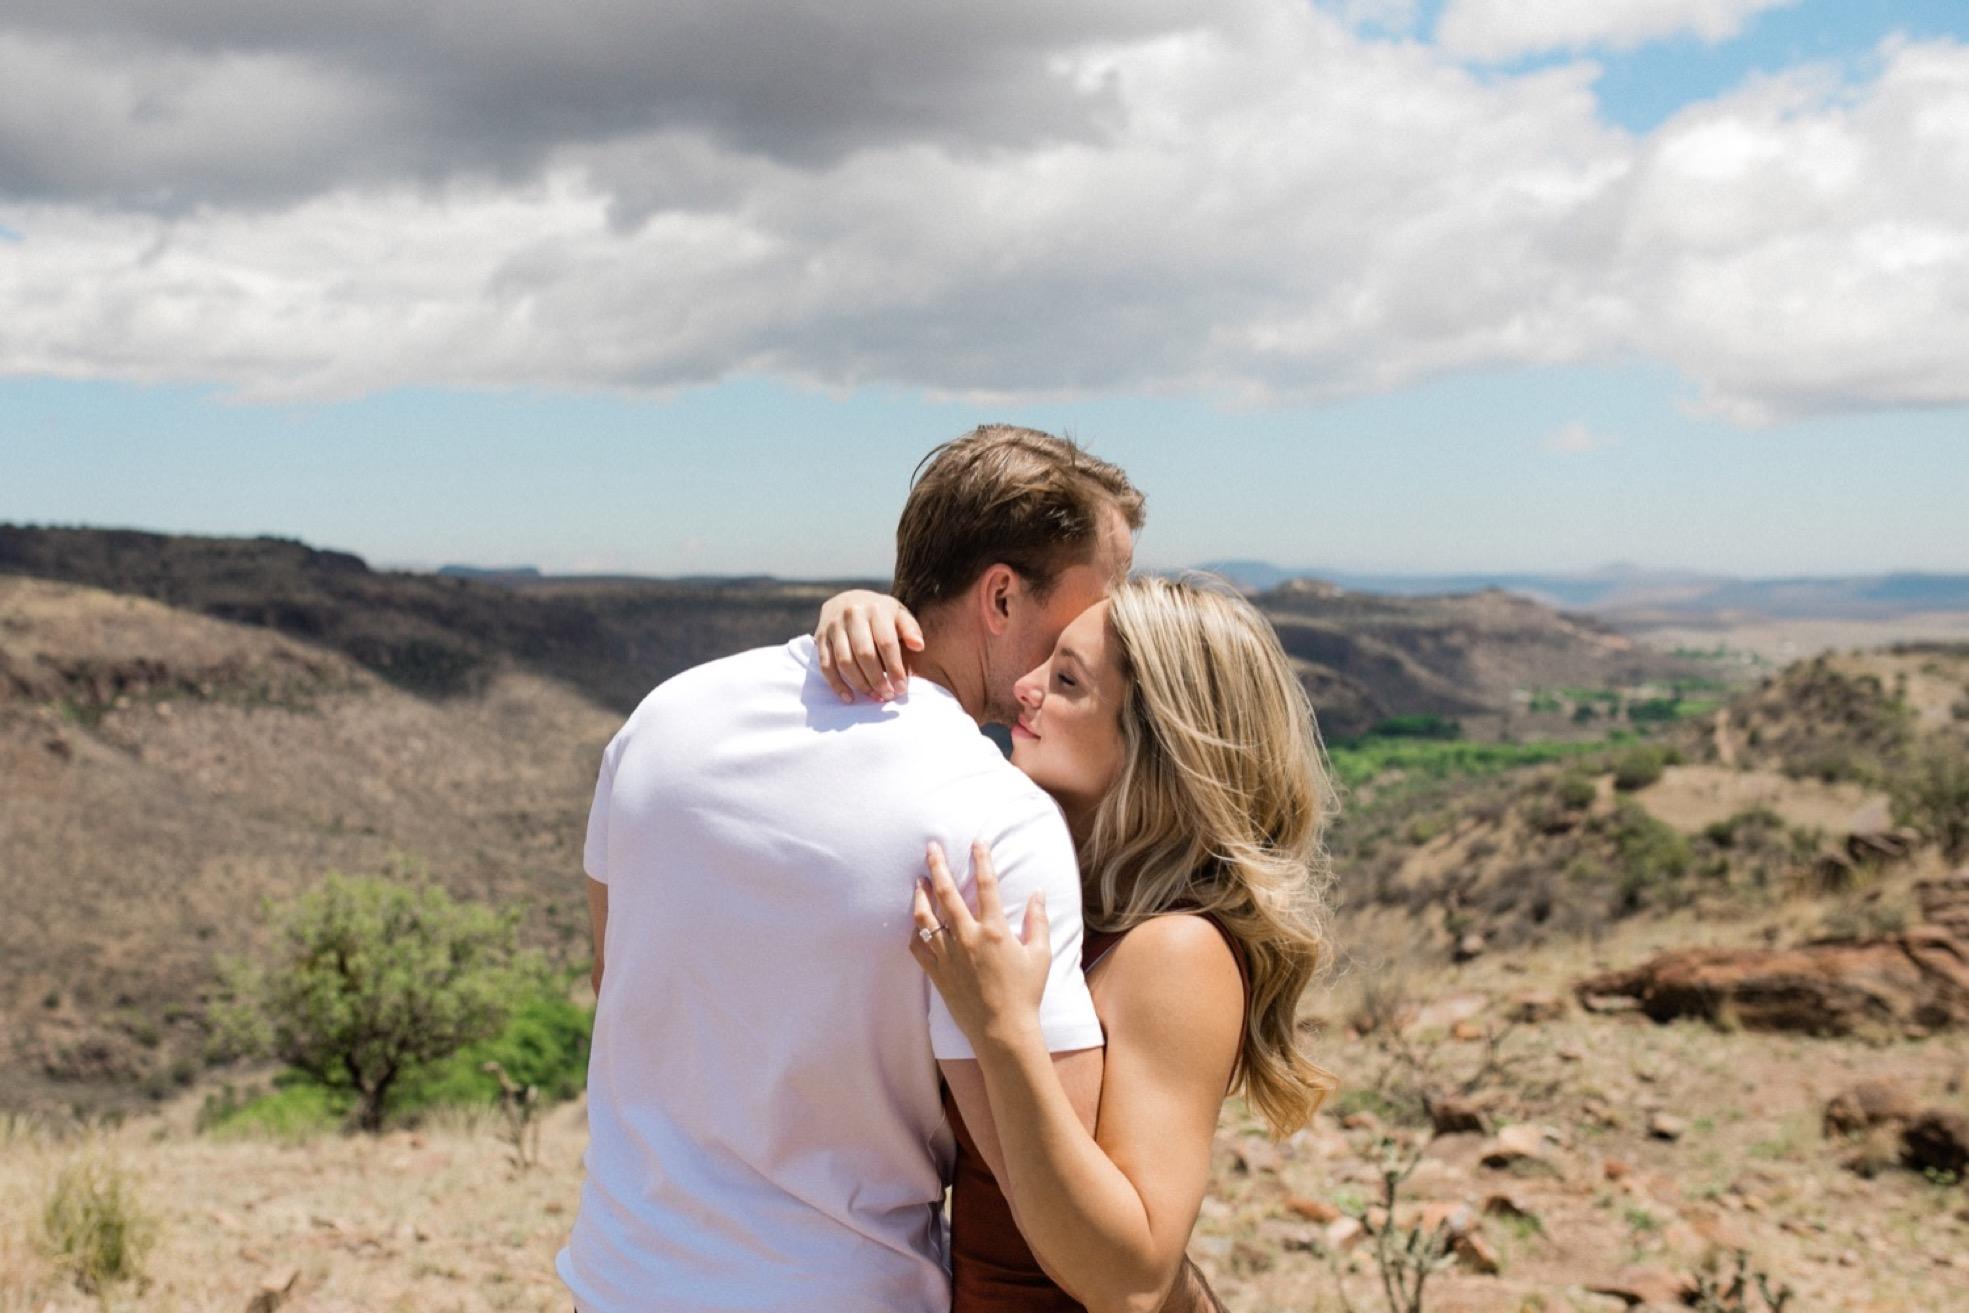 70_Marfa-Texas-Engagement-Jessica-Sherrell-57.jpg